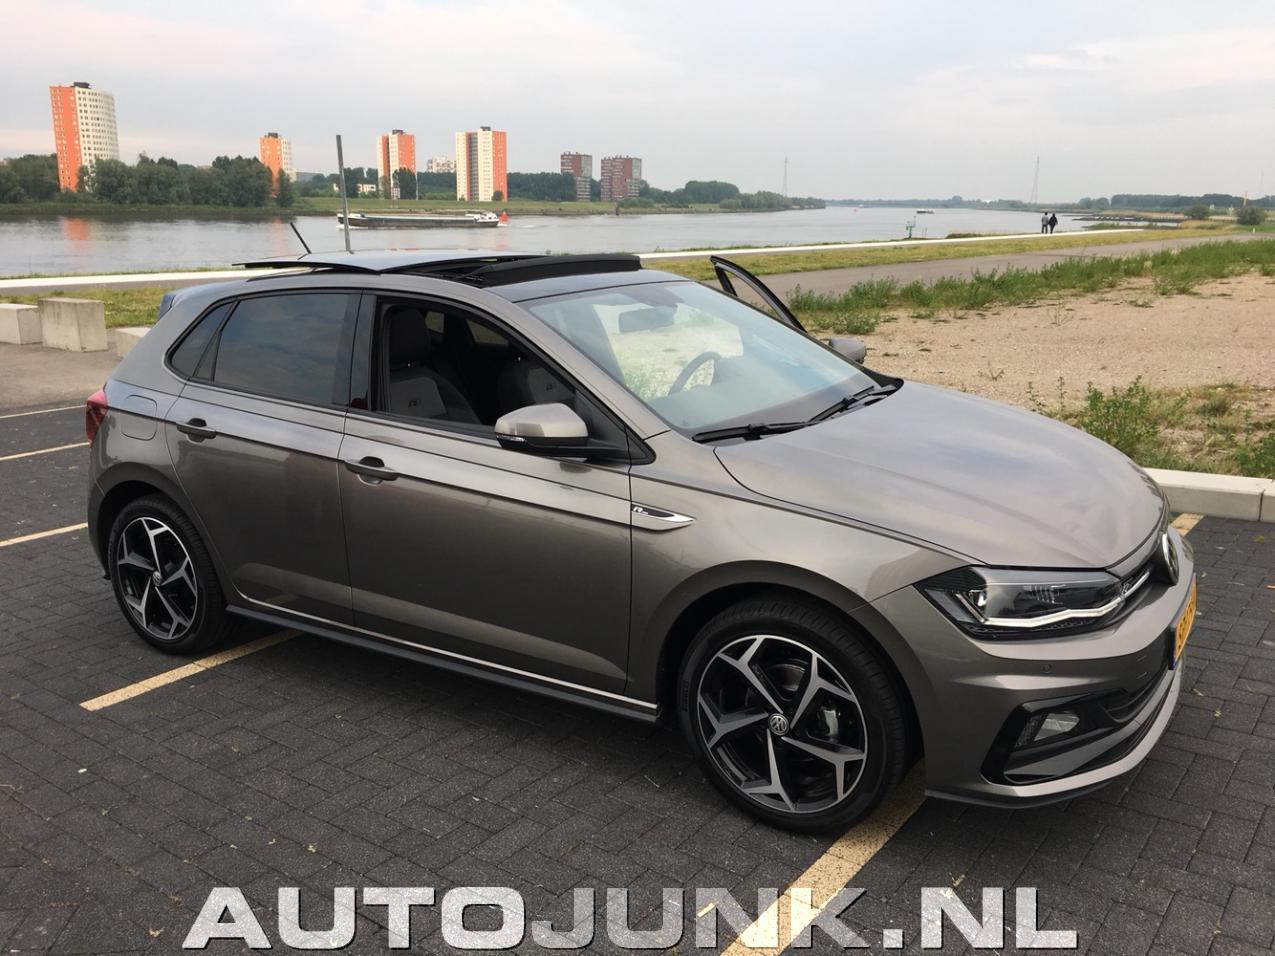 Mijn Auto Volkswagen Polo Aw R Line Fotos Autojunknl